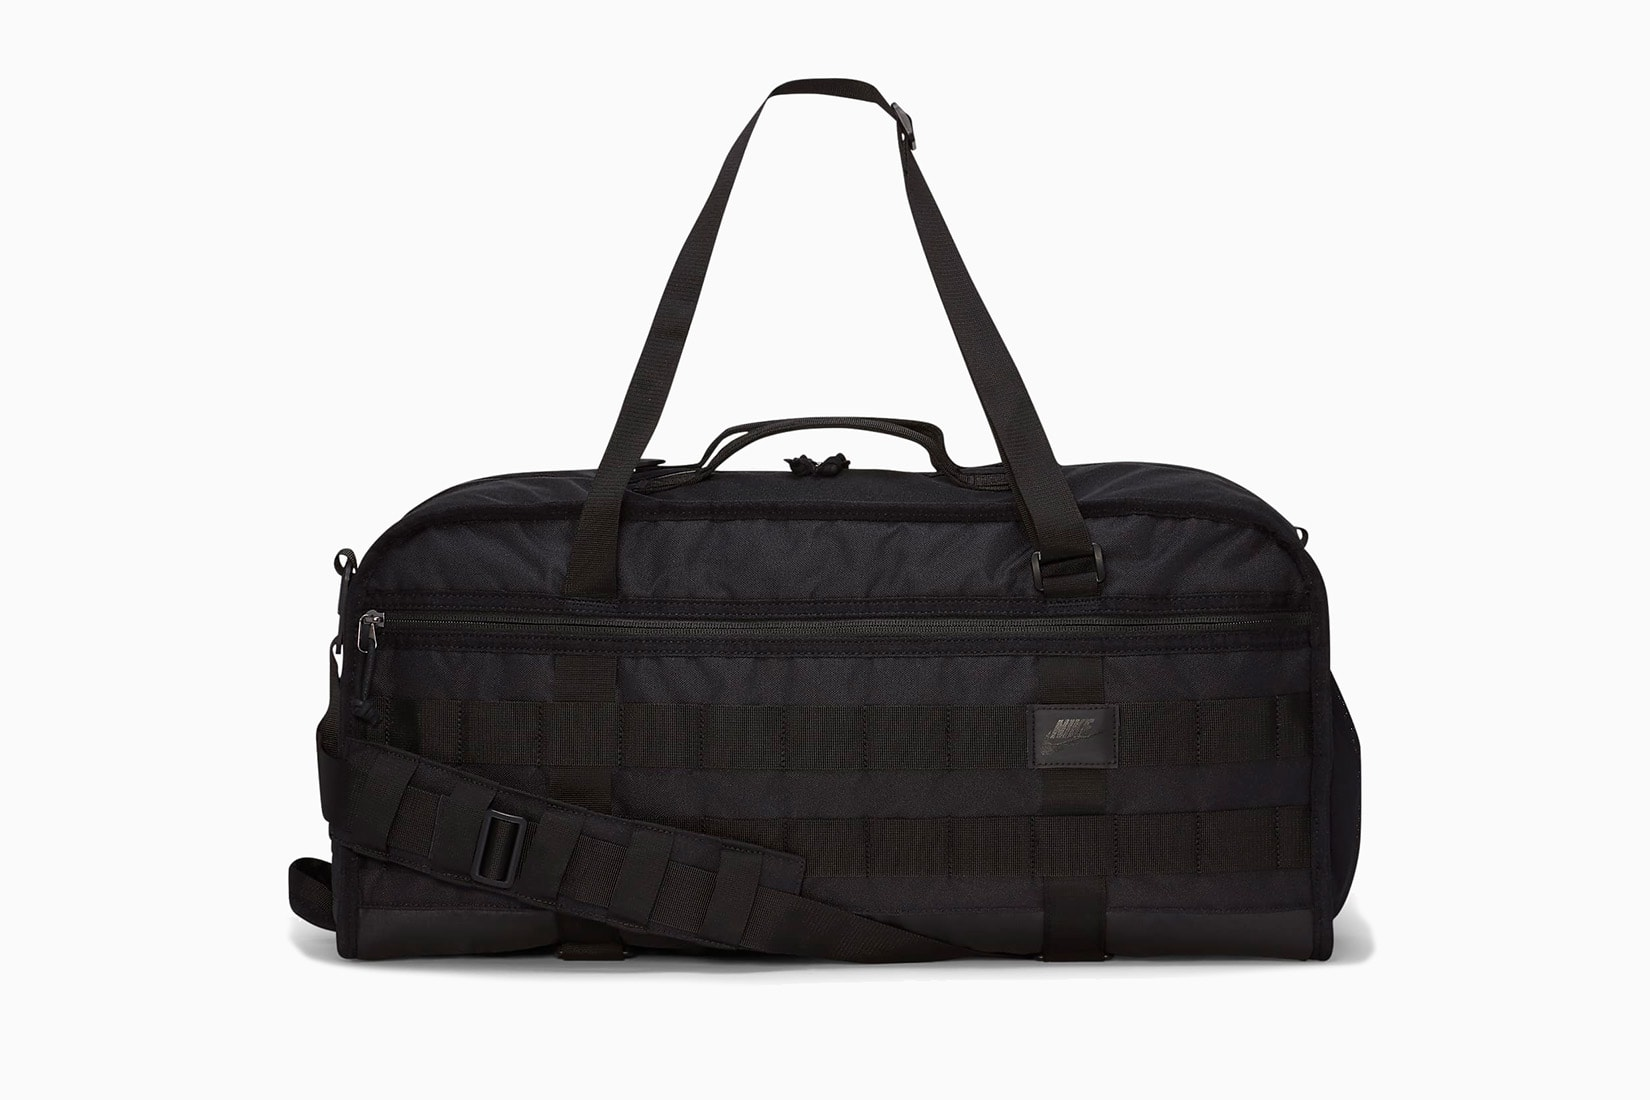 best men gym bag sports gear nike rpm review - Luxe Digital